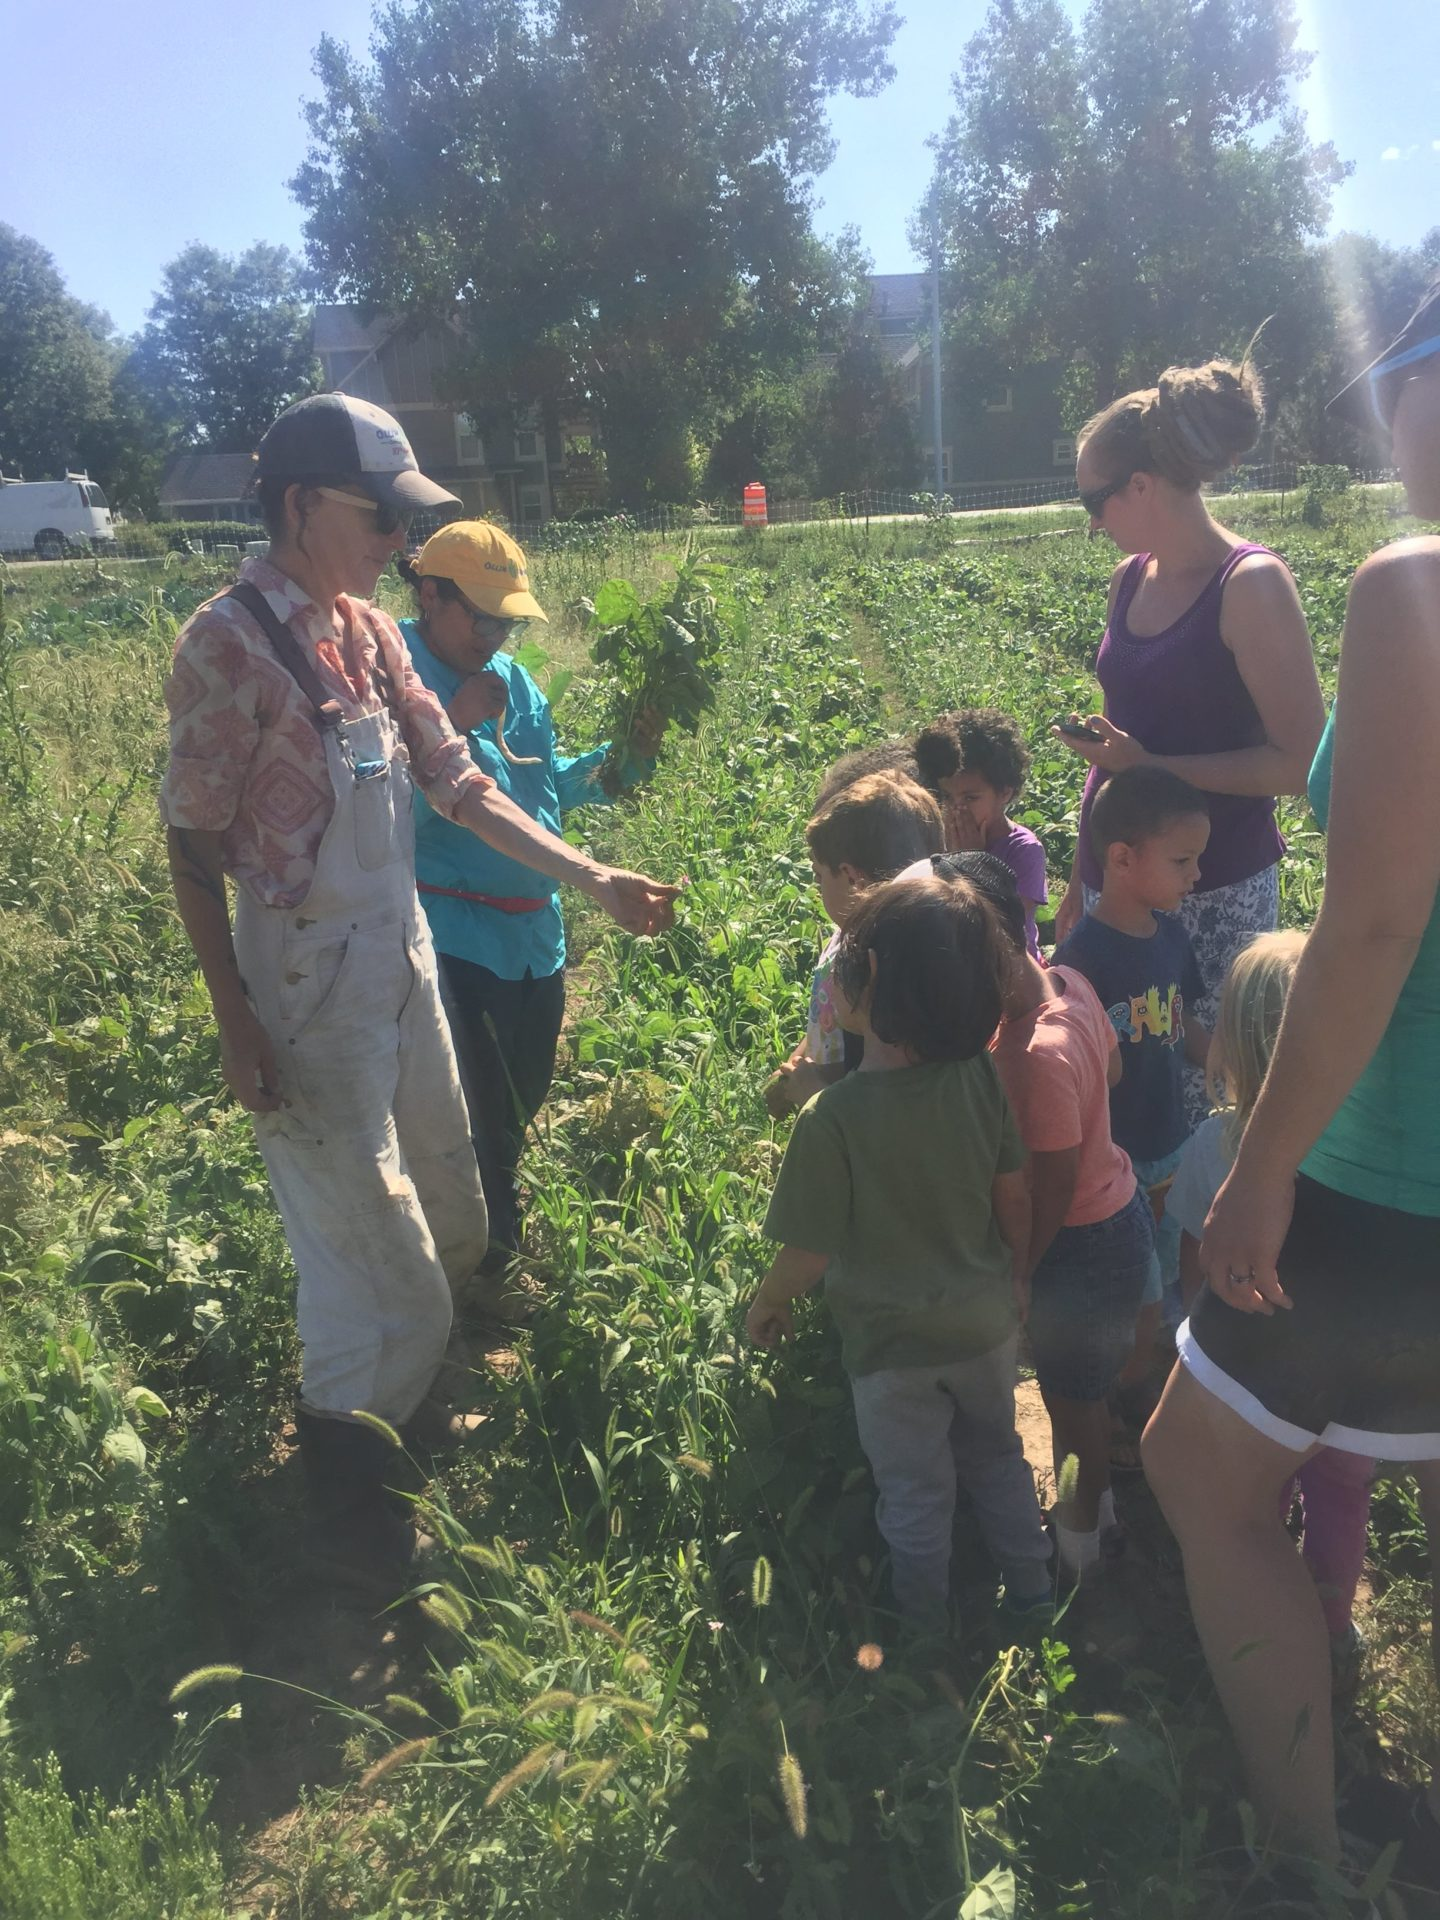 Children and teachers enjoy a field trip to a farm